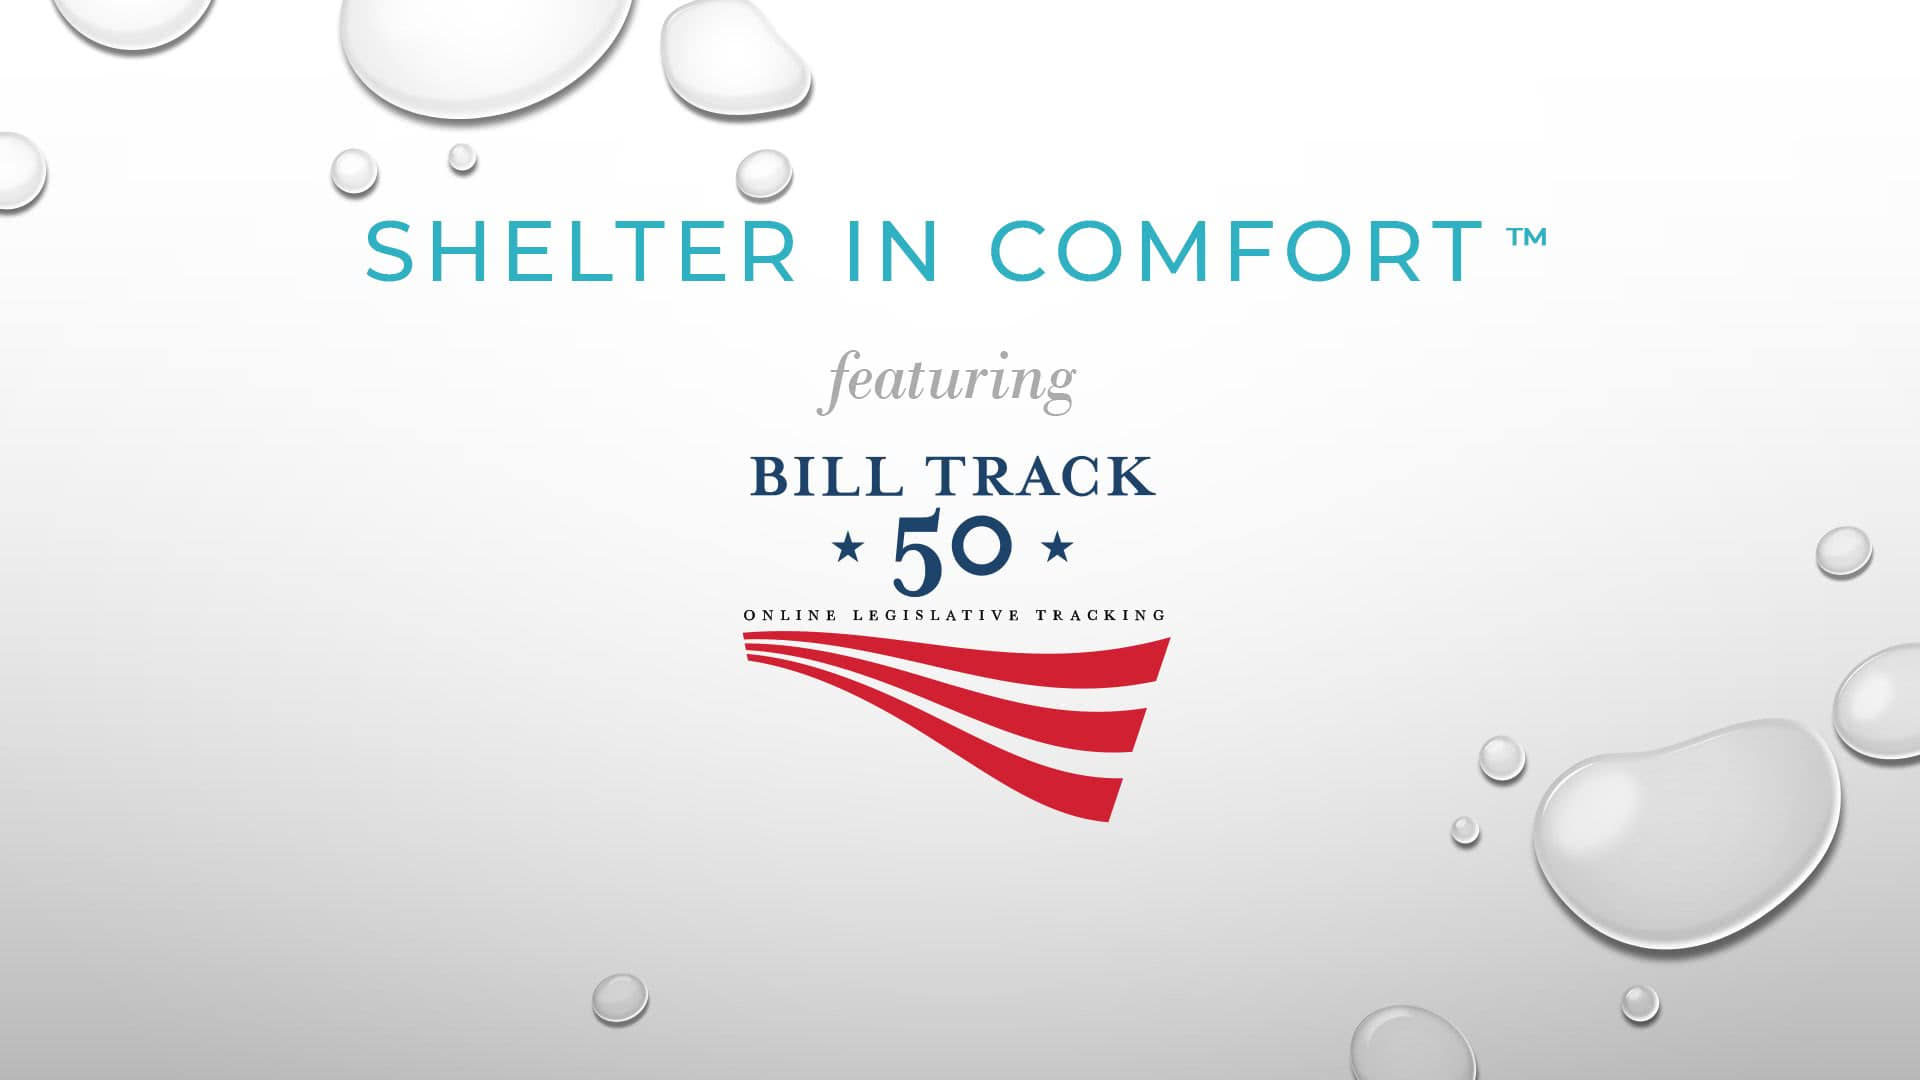 Shelter in Comfort: featuring BillTrack50